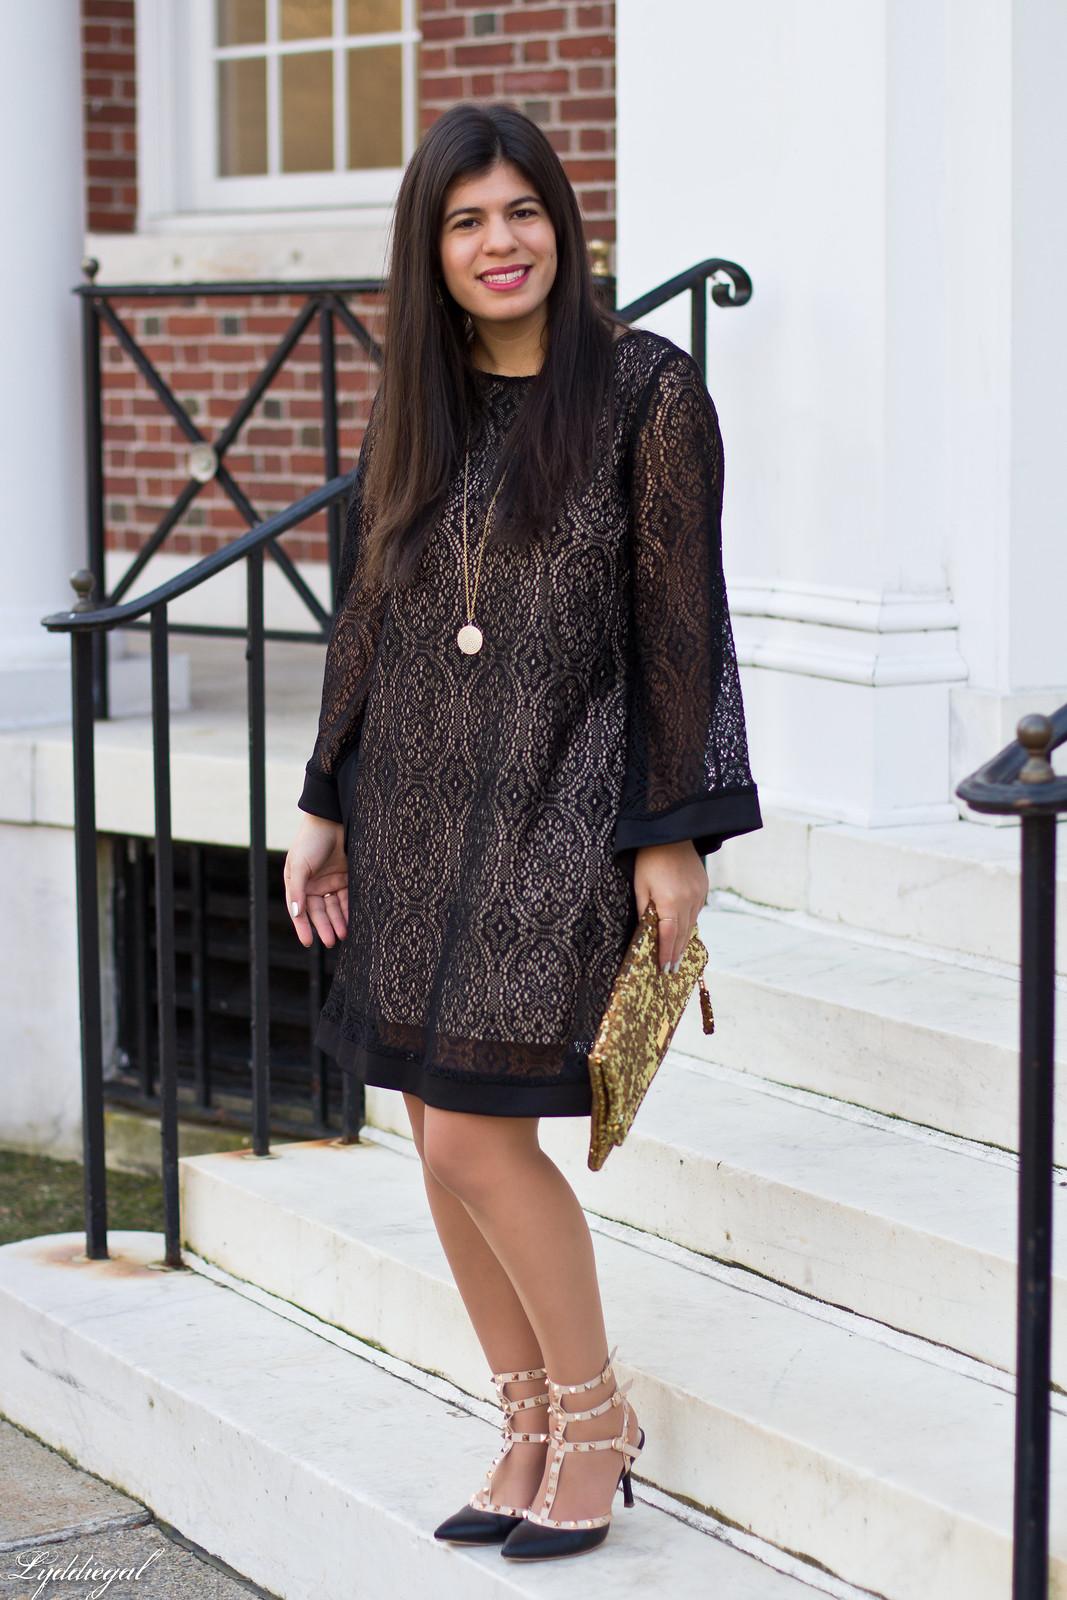 black lace dress, gold sequin clutch, studded pumps-1.jpg